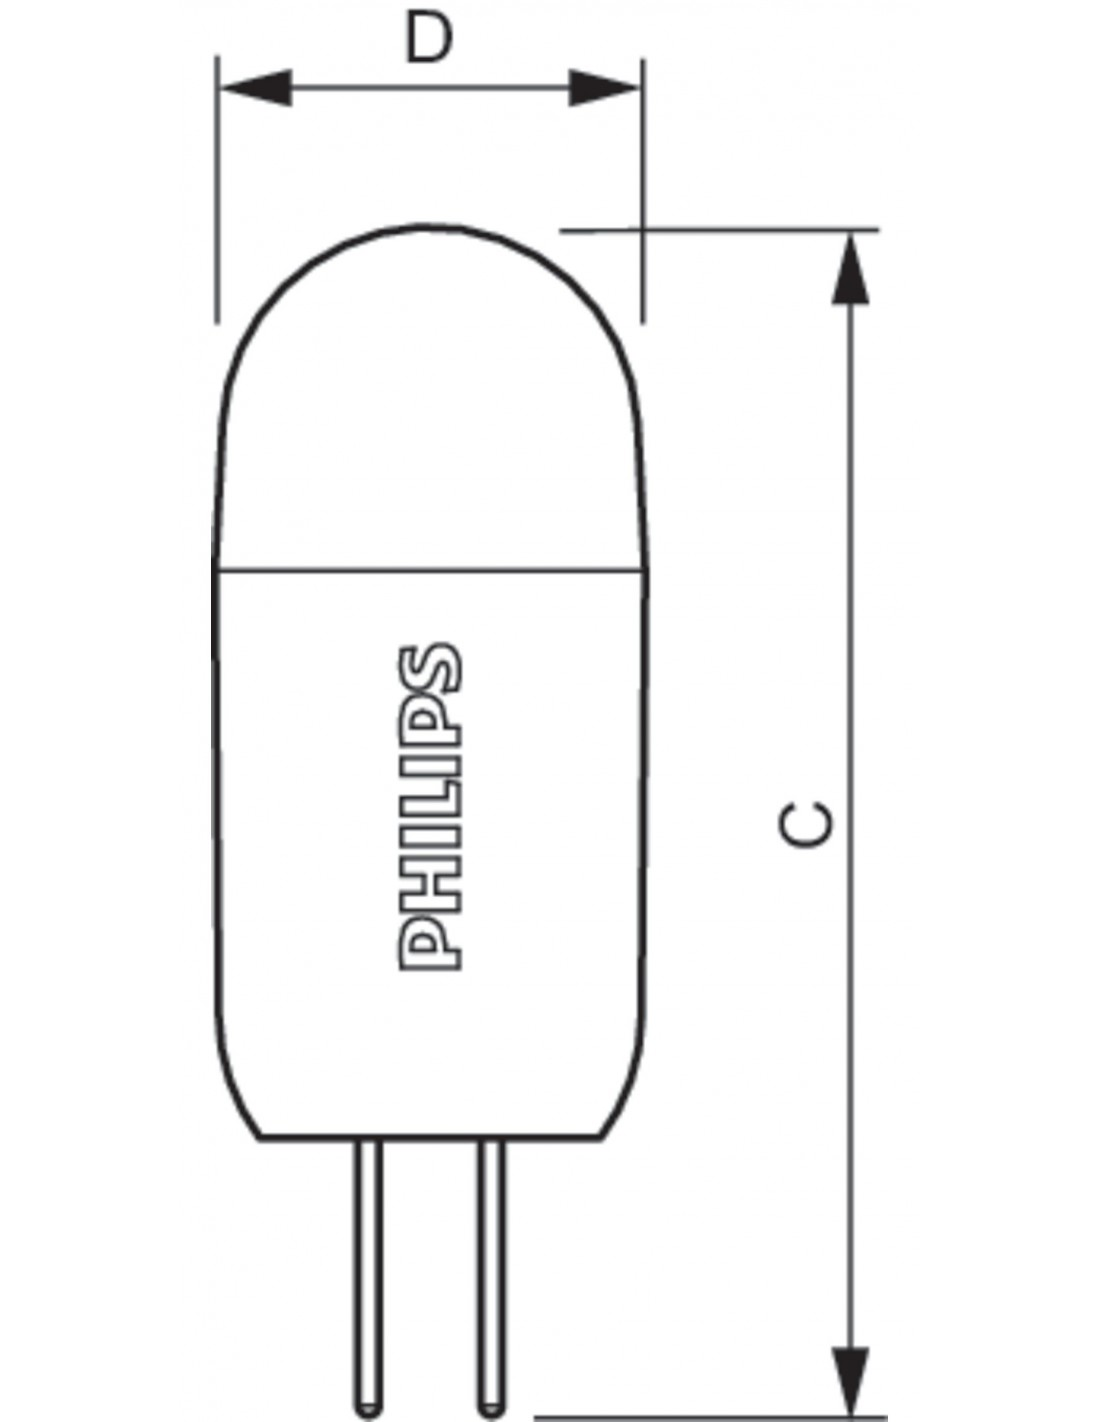 Illa G4 Regulable Corepro Ledcapsula 2w De Philips